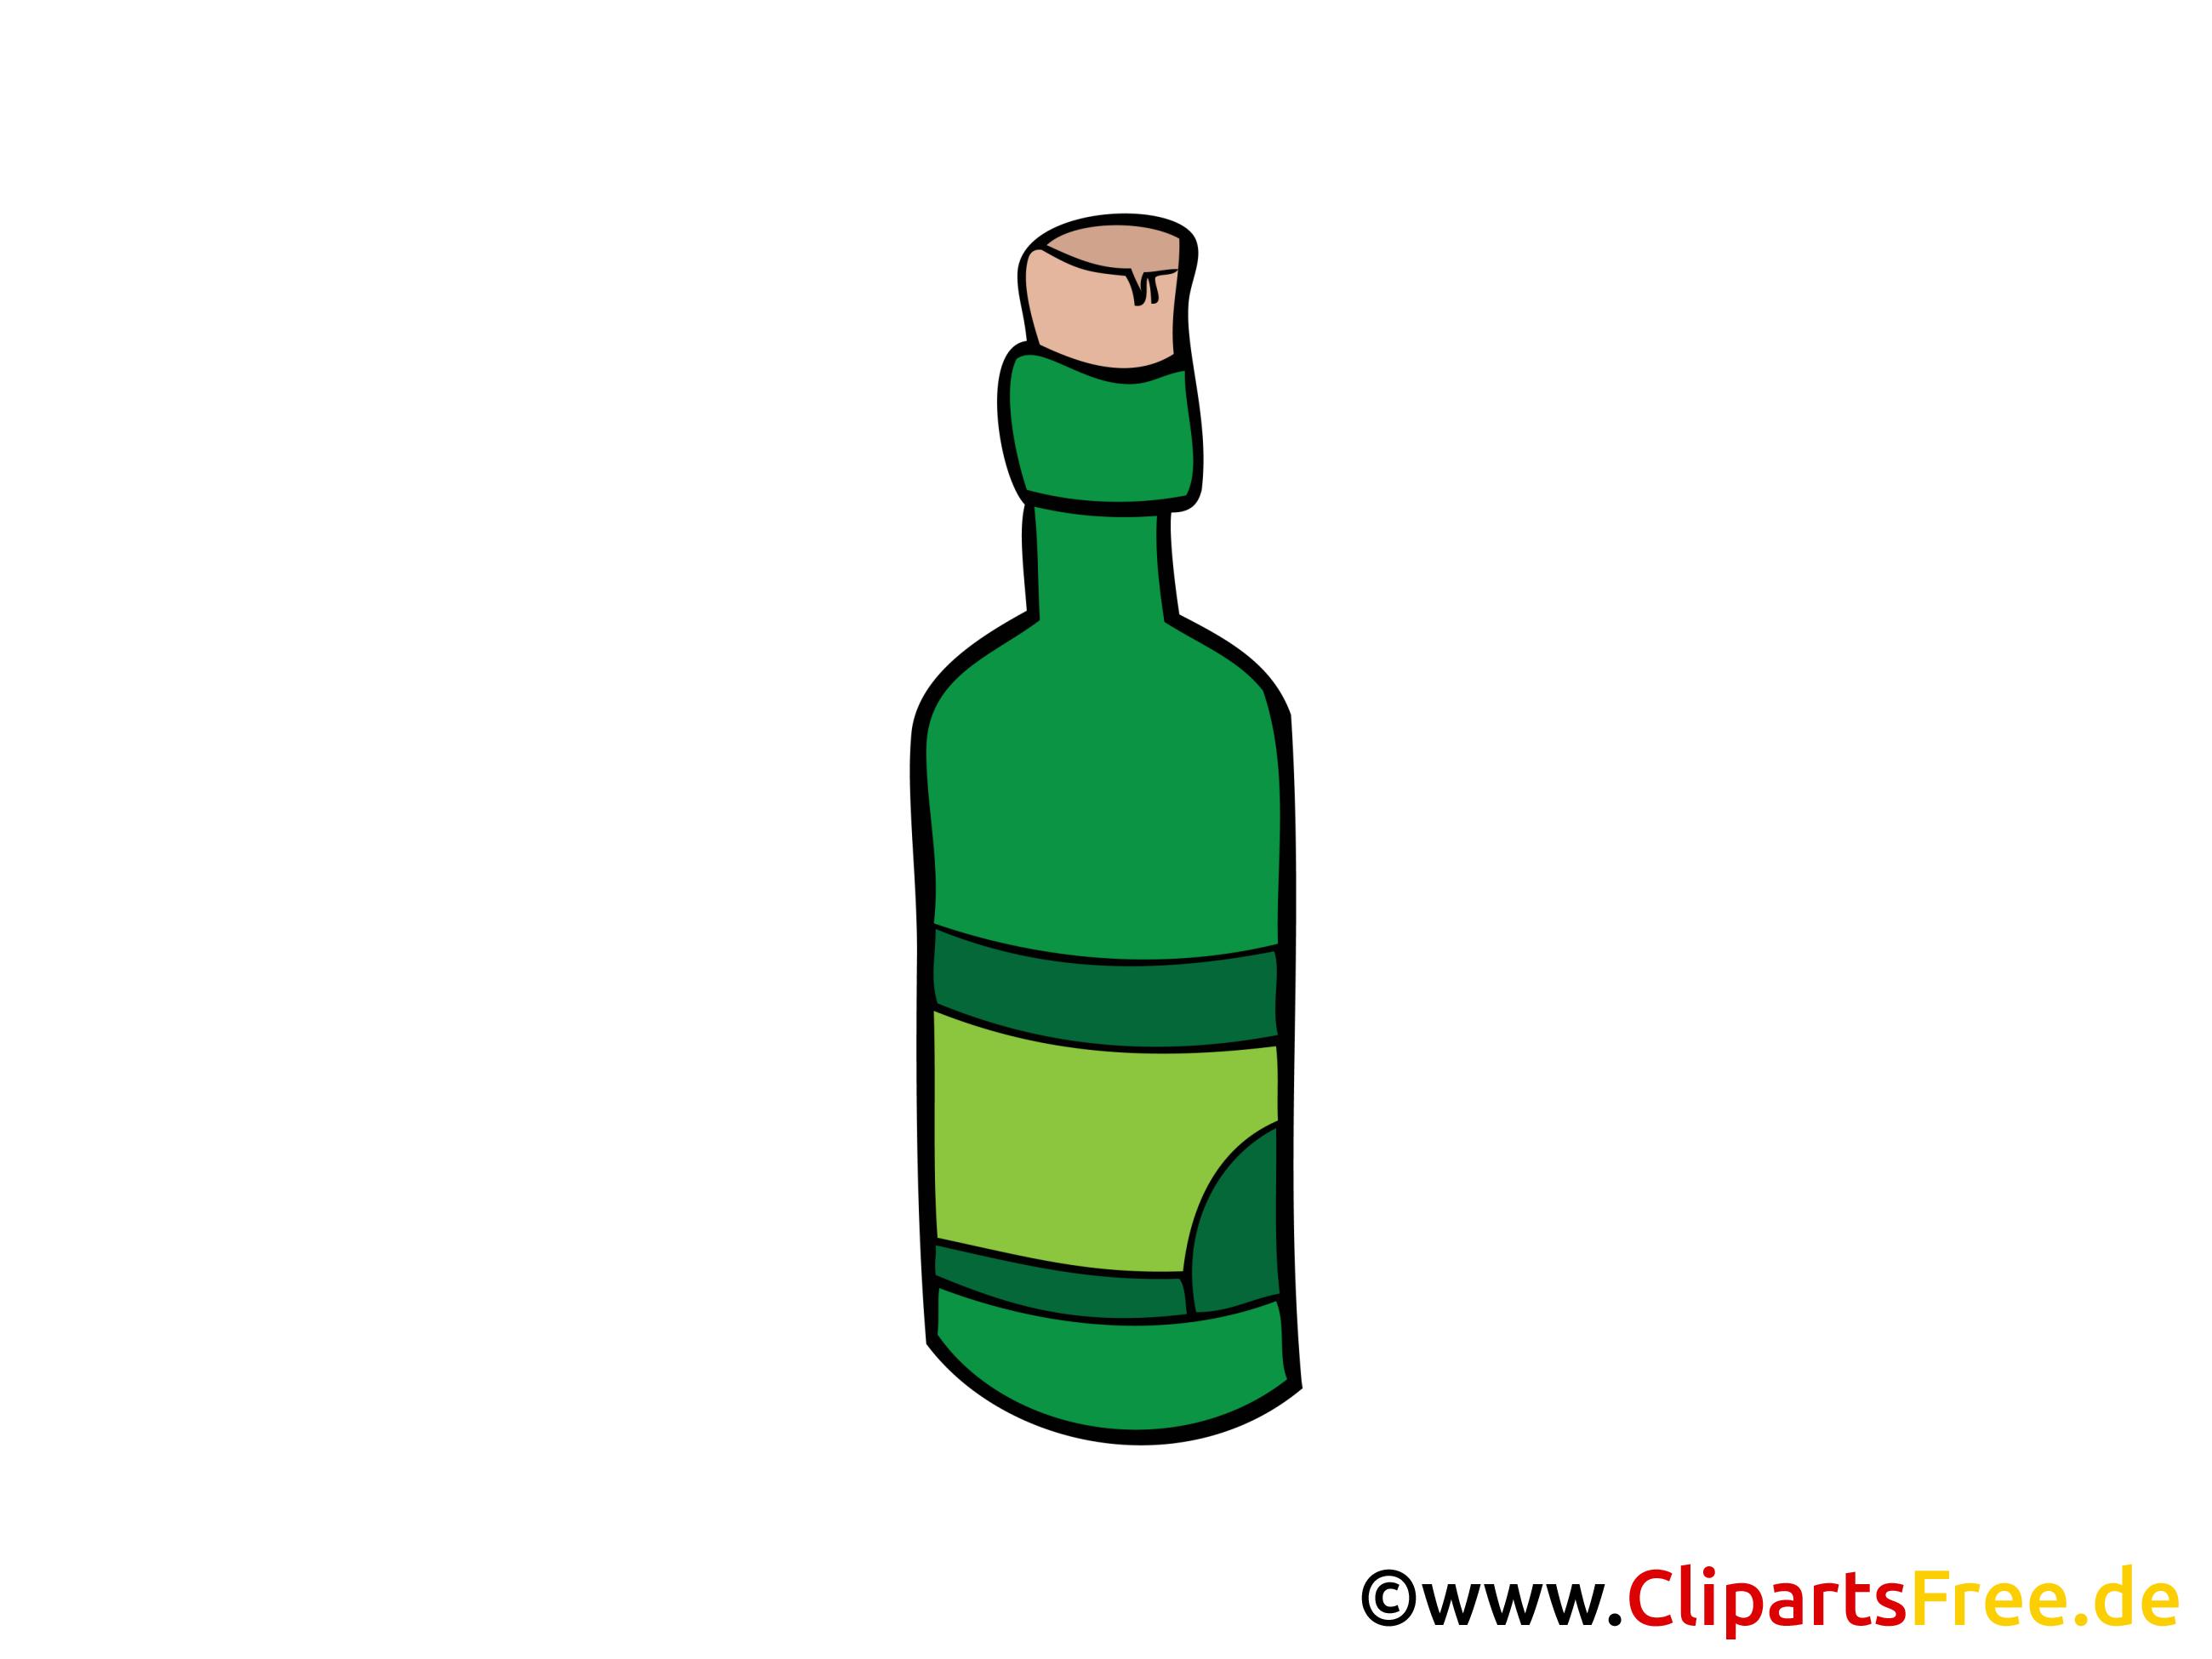 flasche wein bild clipart illustration grafik gratis. Black Bedroom Furniture Sets. Home Design Ideas